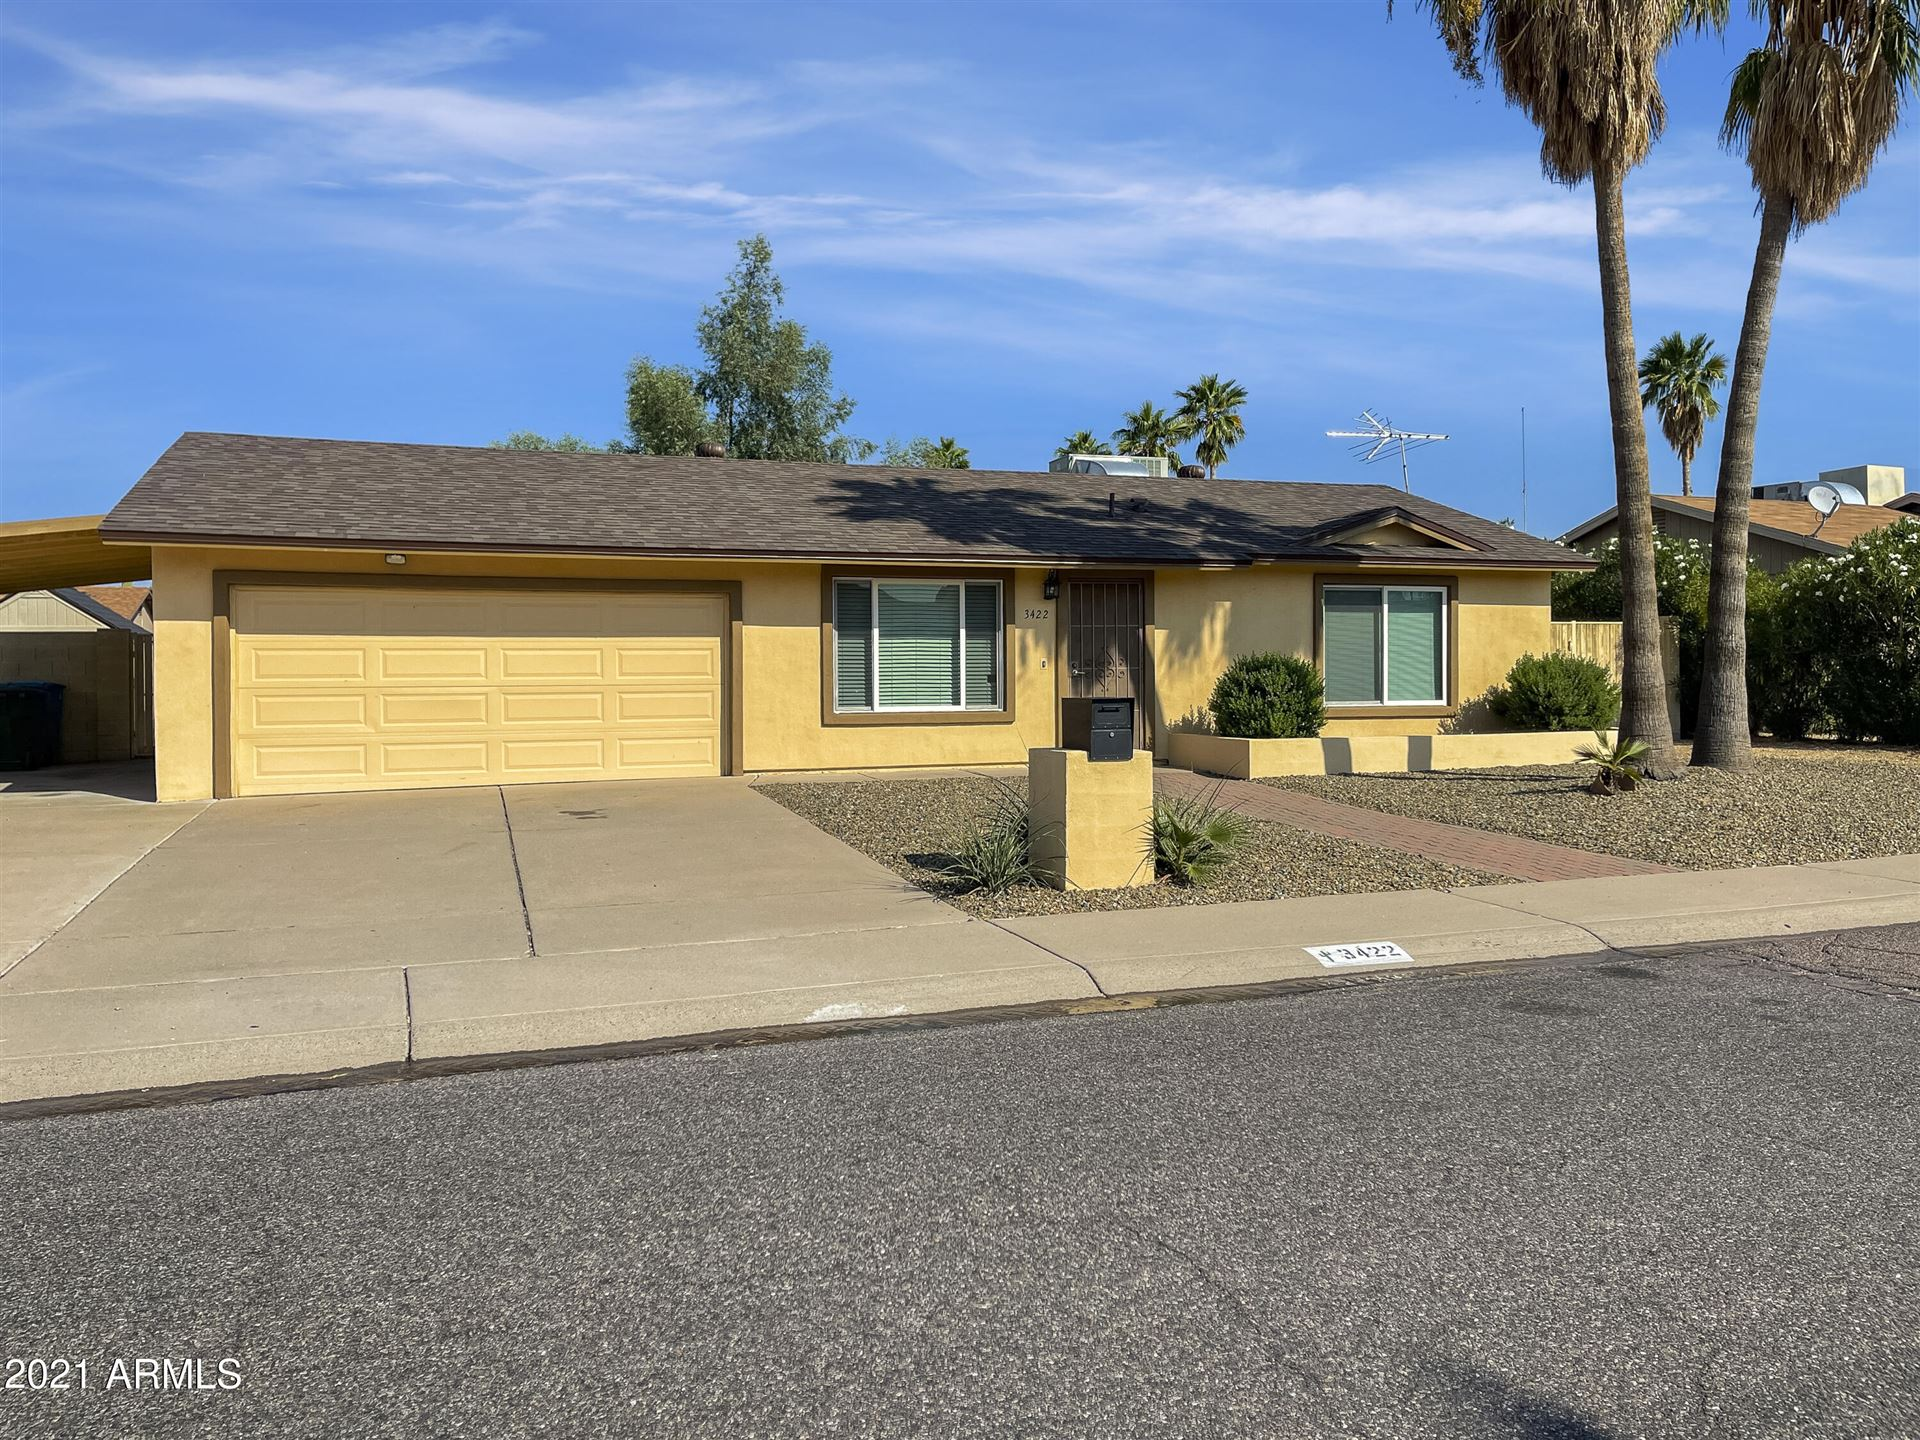 3422 E CAMPO BELLO Drive, Phoenix, AZ 85032 - MLS#: 6294431